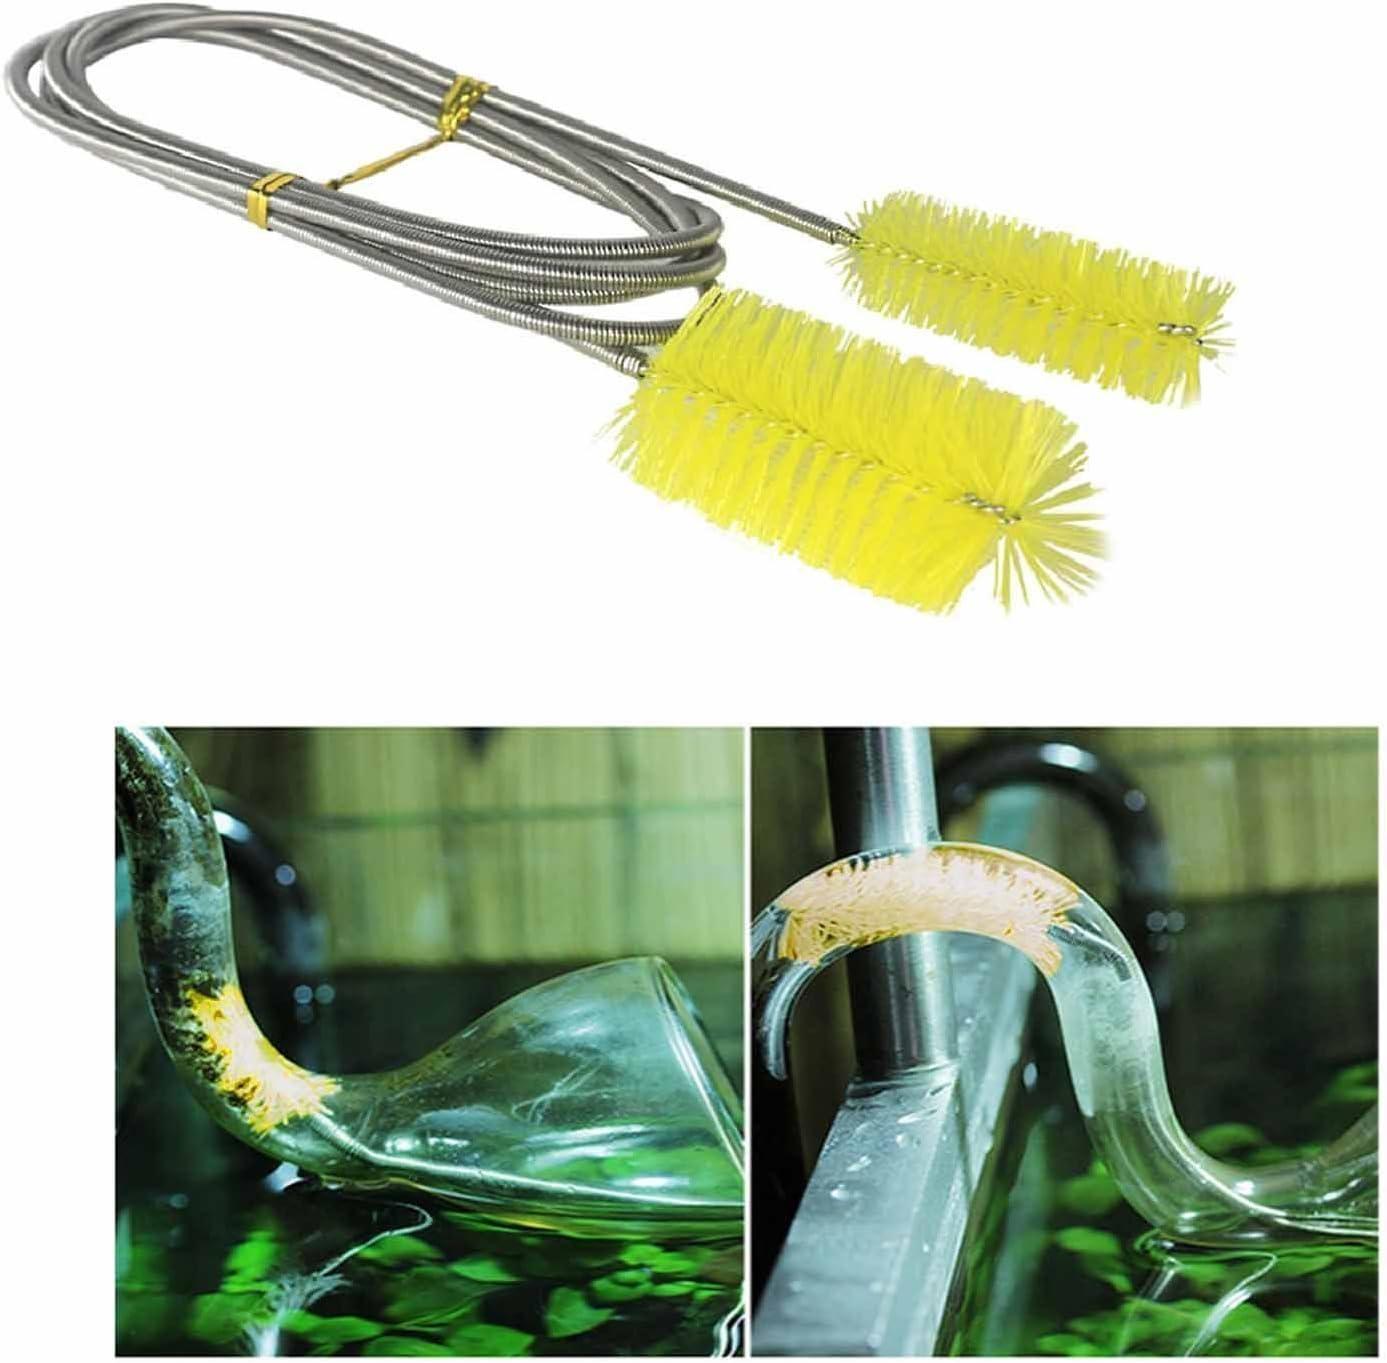 Doble Ended Filtro de agua bomba tubo cepillo de limpieza Limpiador de acuario